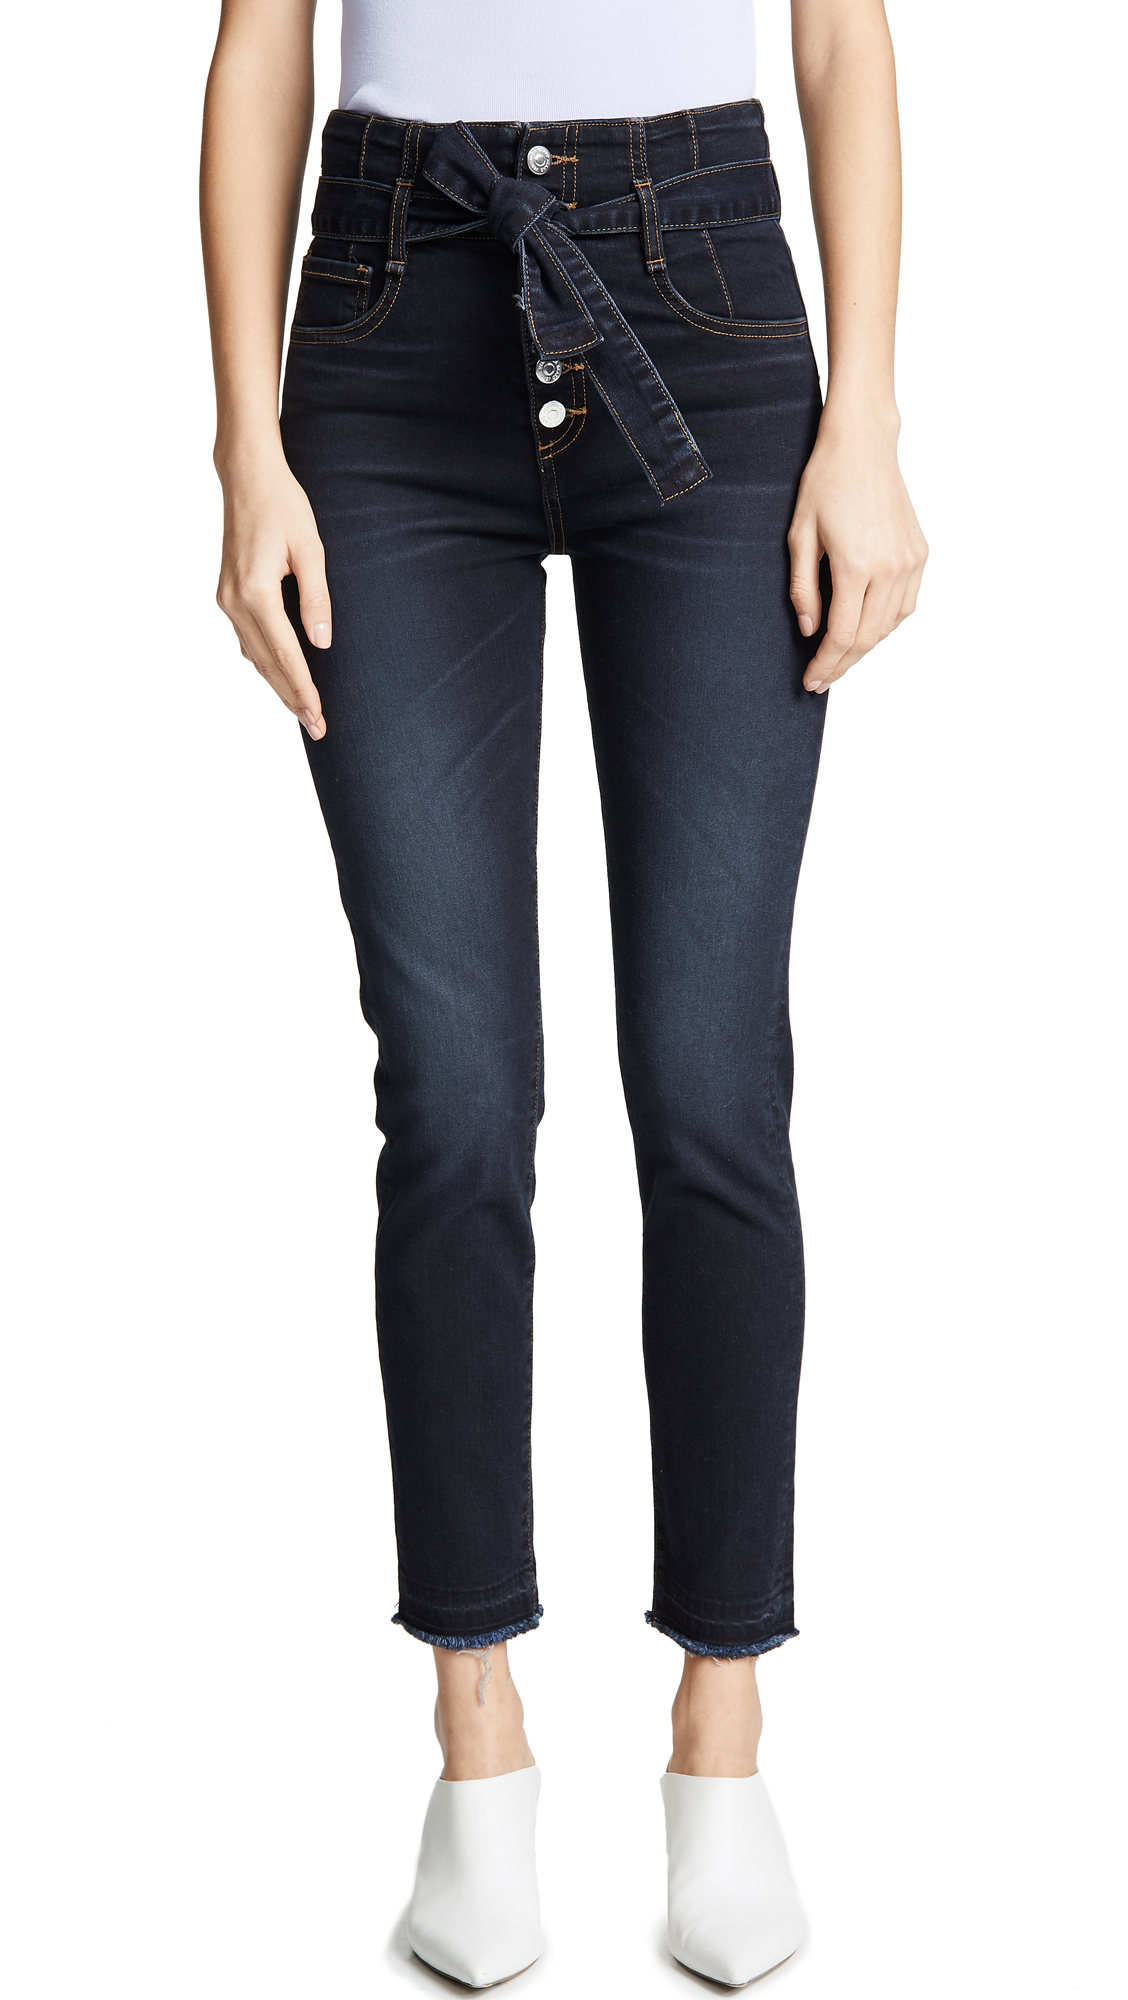 "VERONICA BEARD JEAN Keith 12 Corset Skinny Jeans"" in Dark Slate"